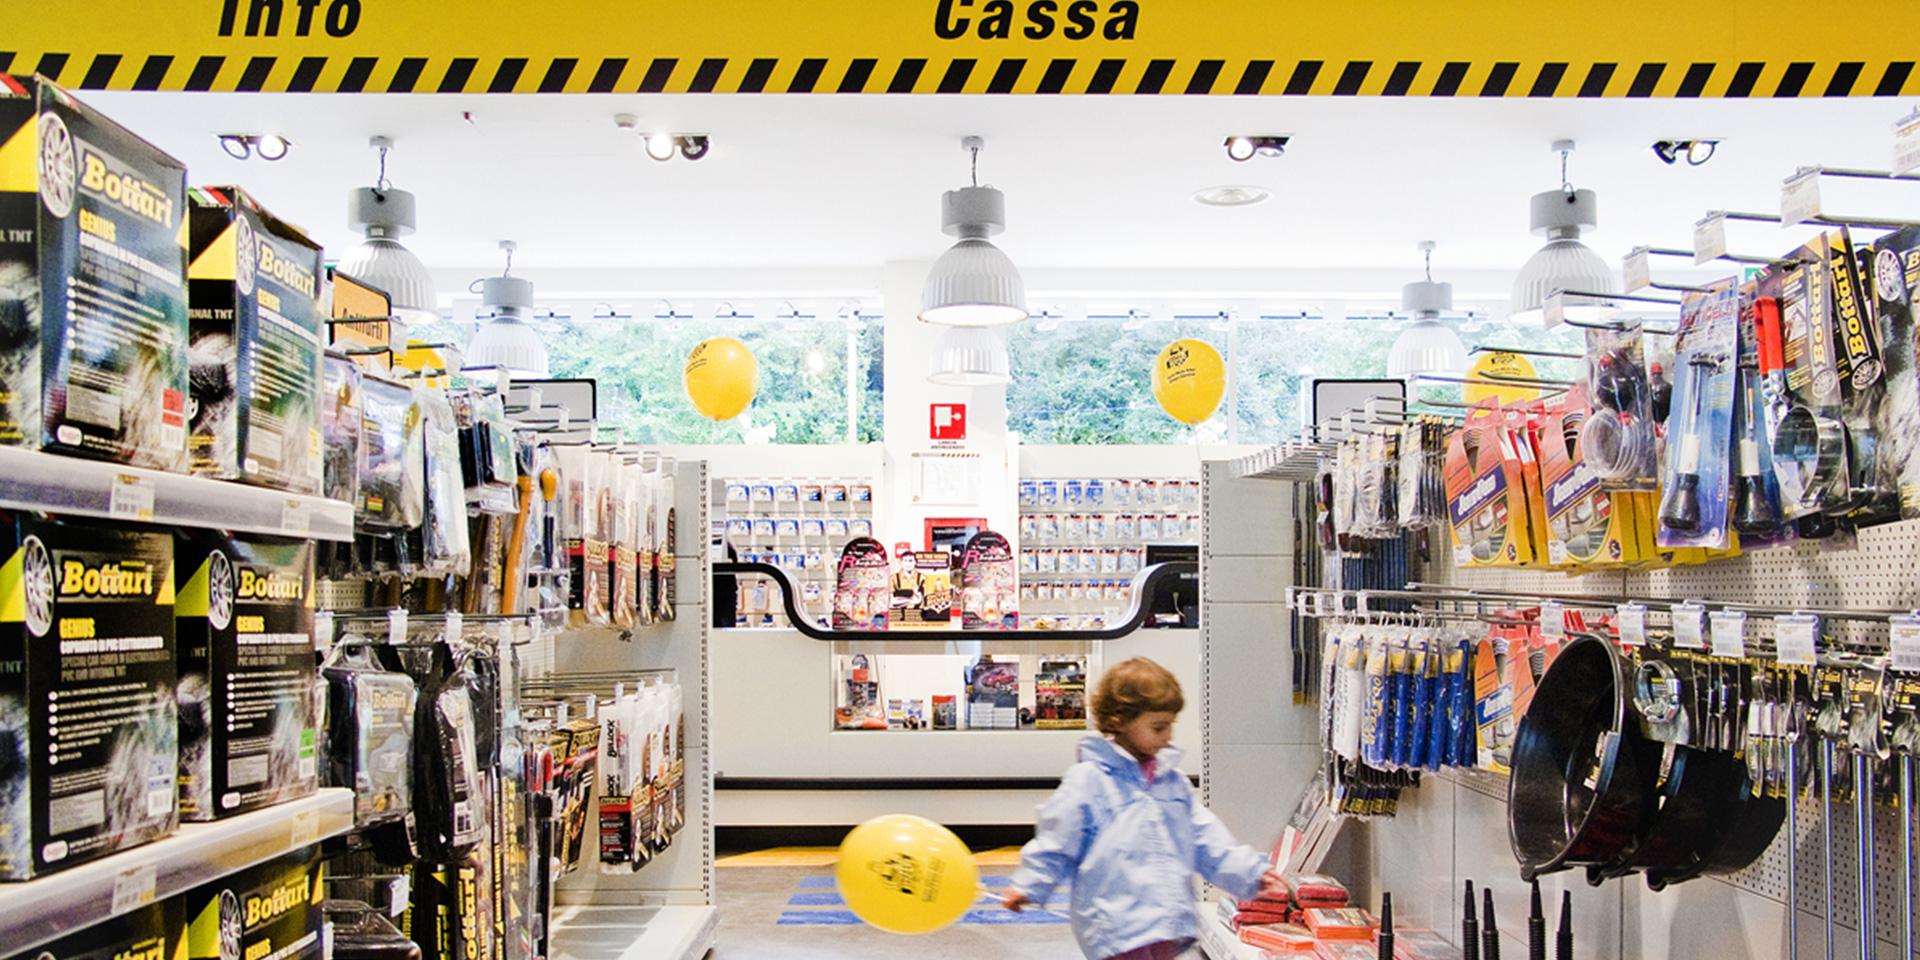 Outlet Bottari a Varese, Binini Partners, Società di architettura e ingegneria